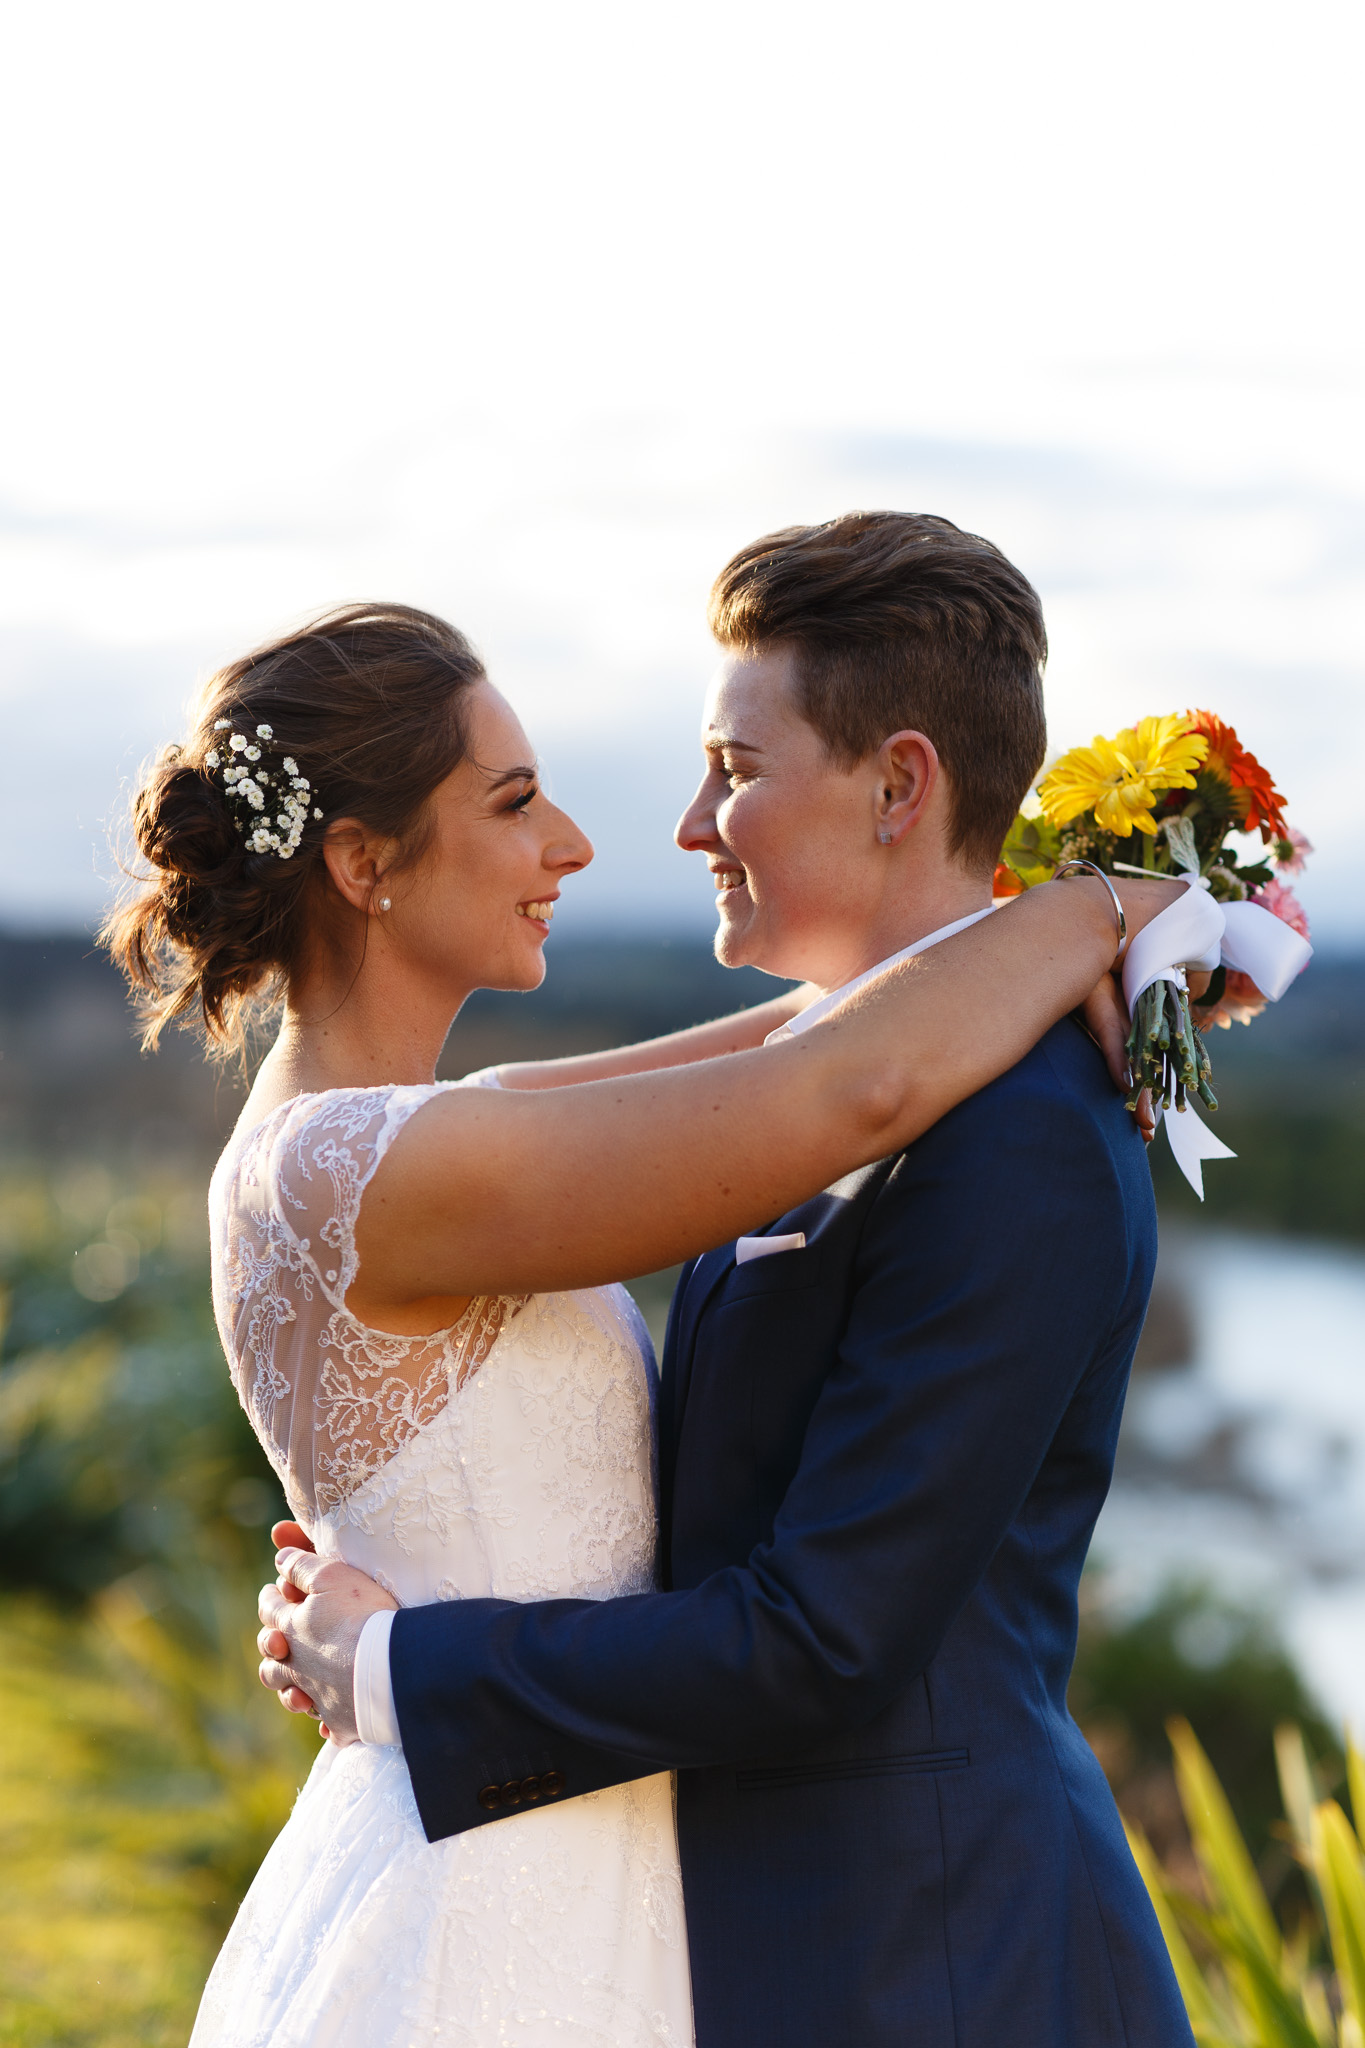 palmerston-north-wedding-photography-highlight-new-zealand.jpg-515.jpg